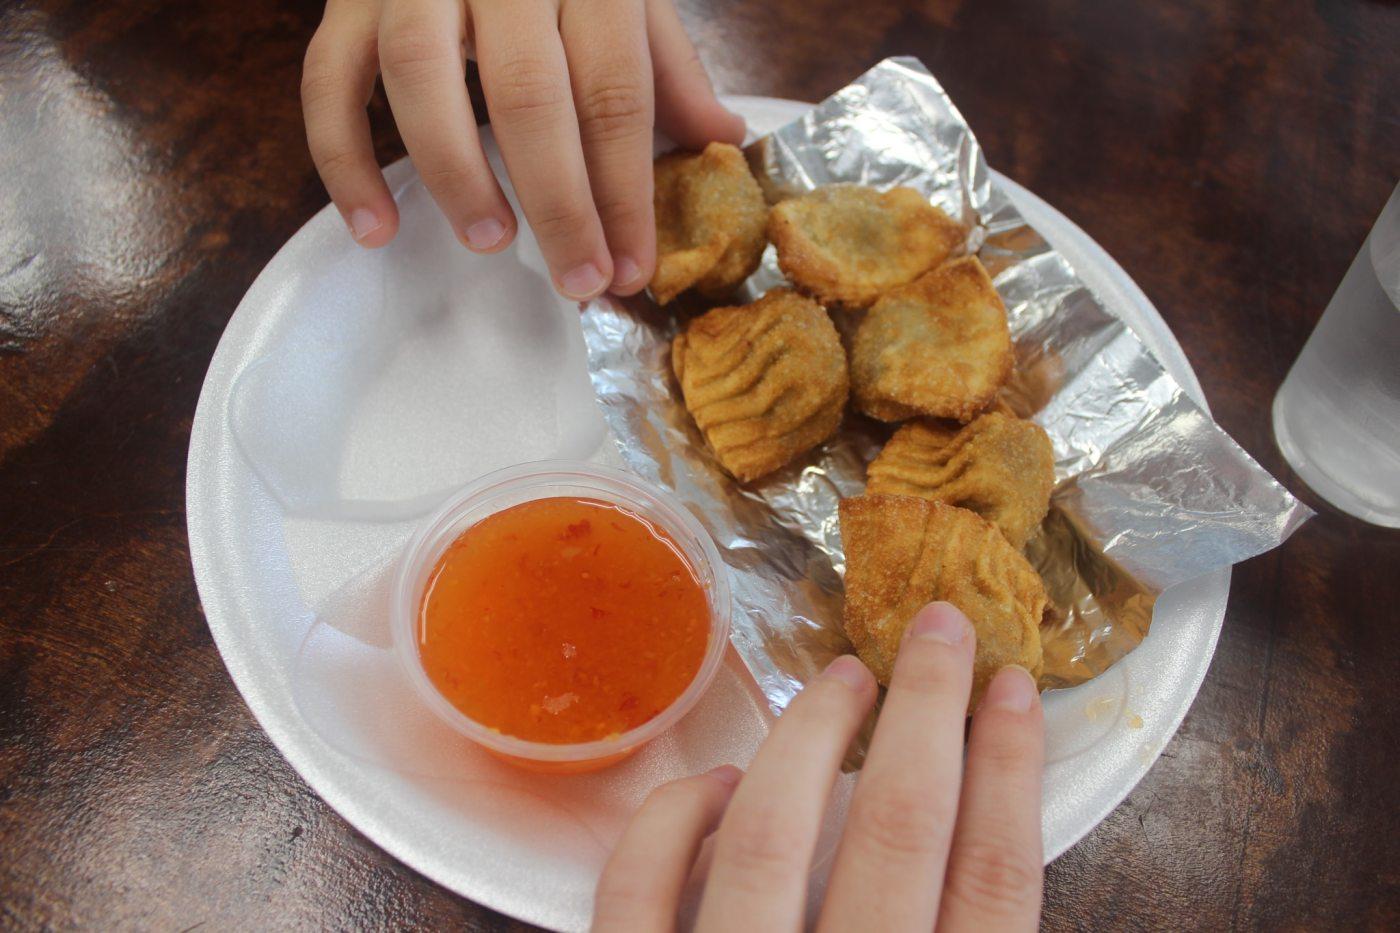 Blue Pacific dumplings